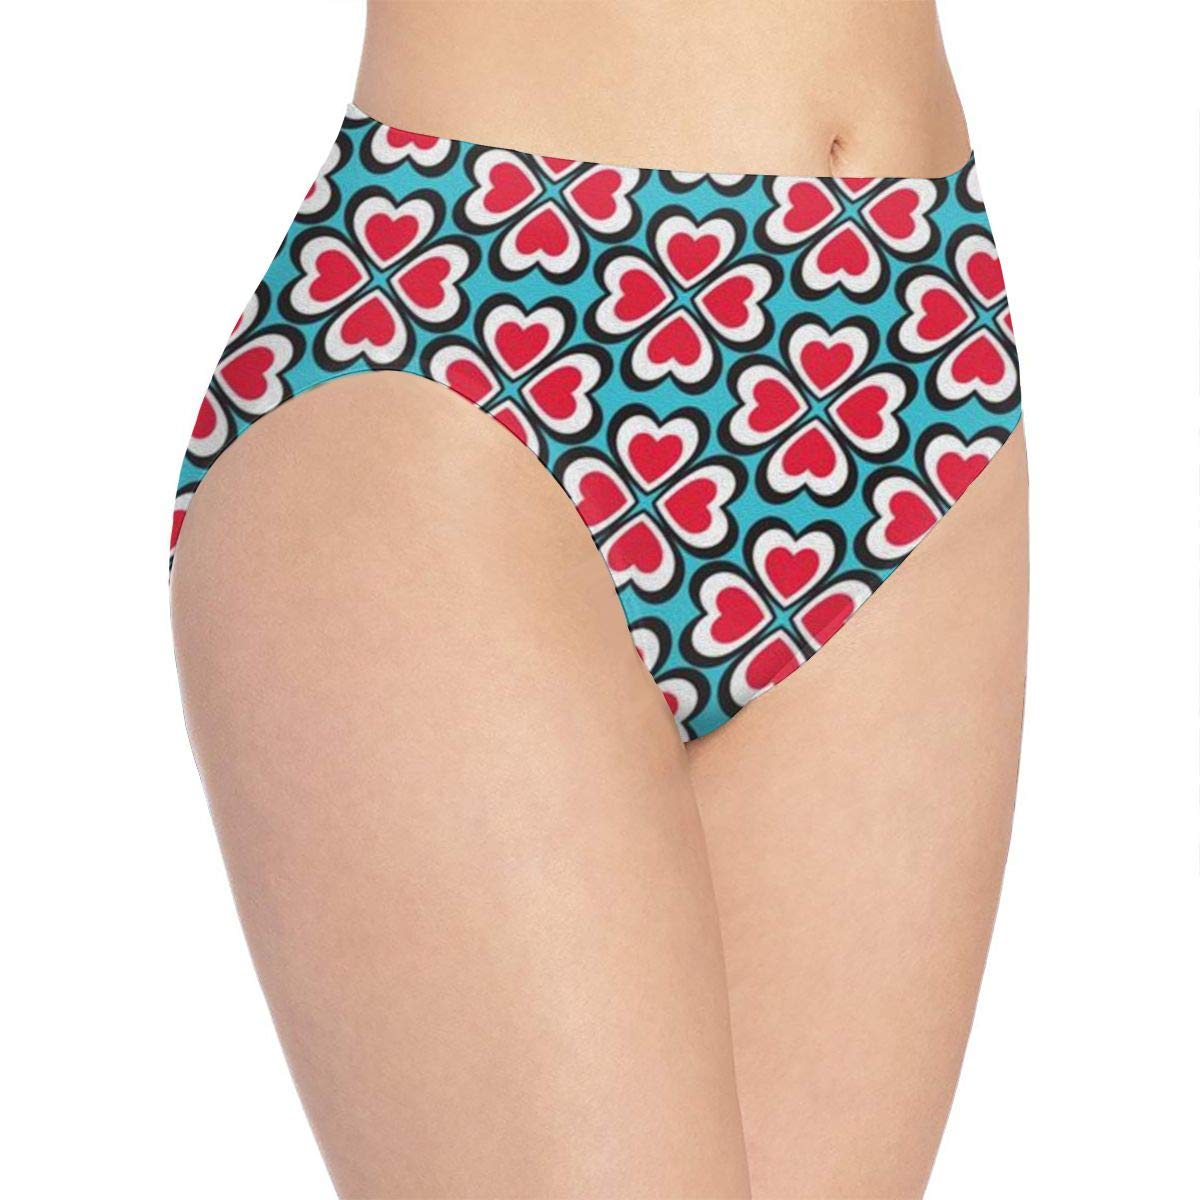 Womens Love Clover Bikini Briefs Comfy Full Coverage Underwear